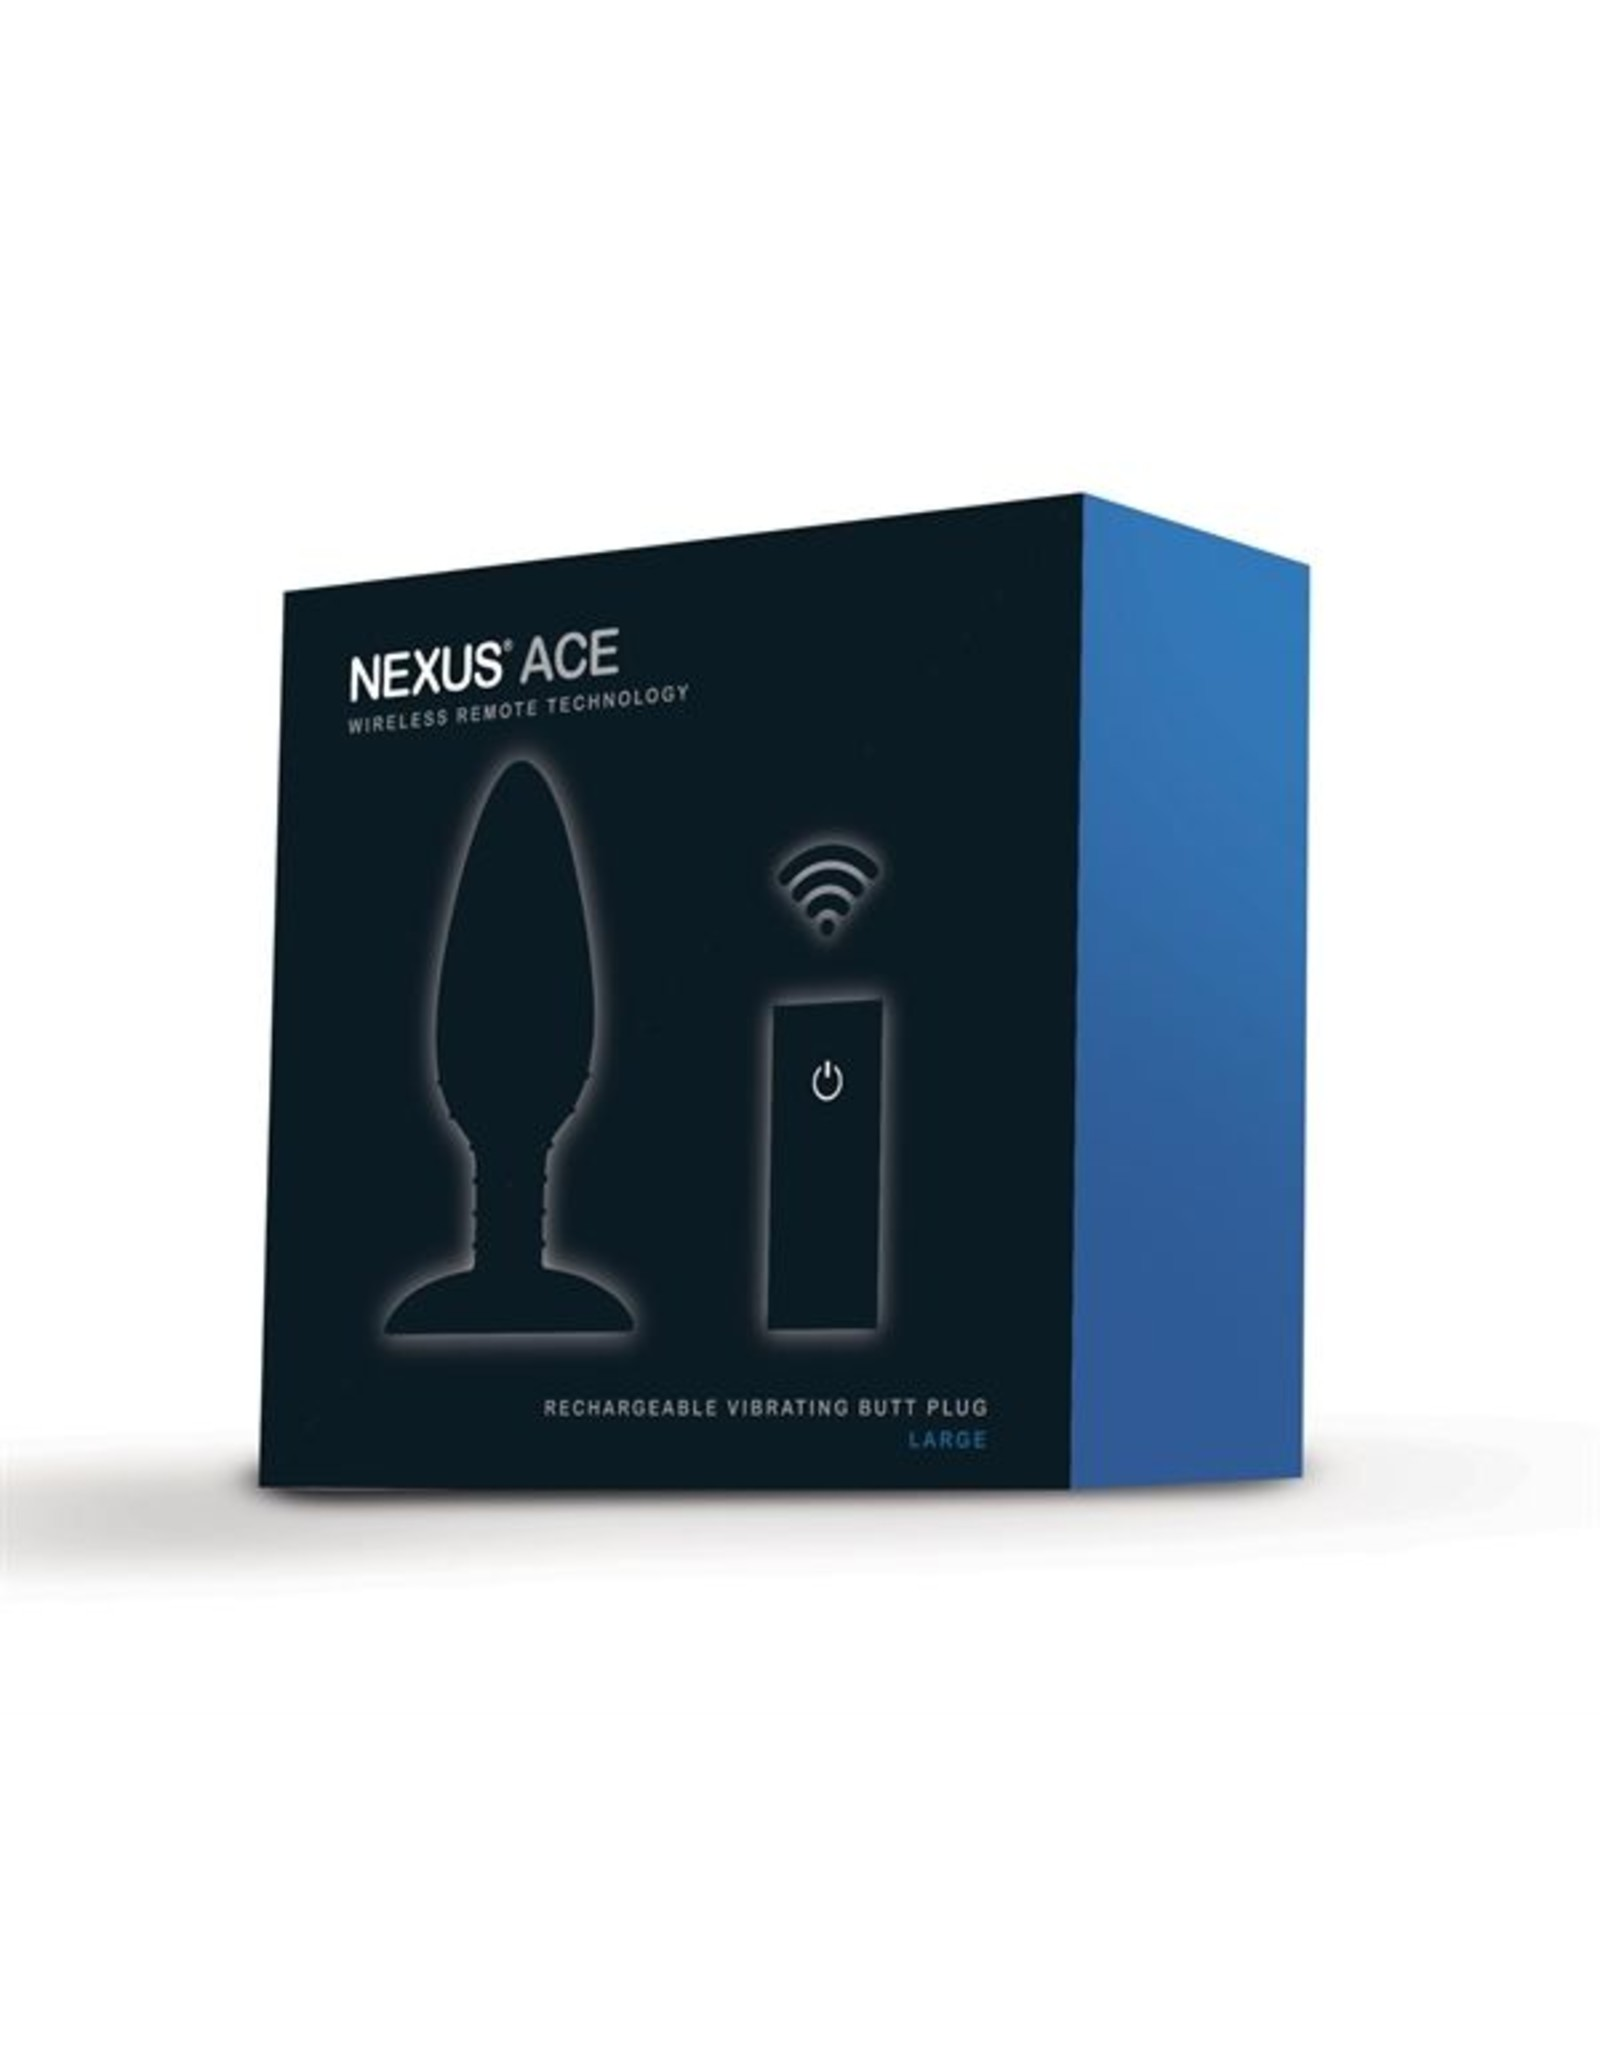 Nexus Ace Vibrating Butt Plug - grand